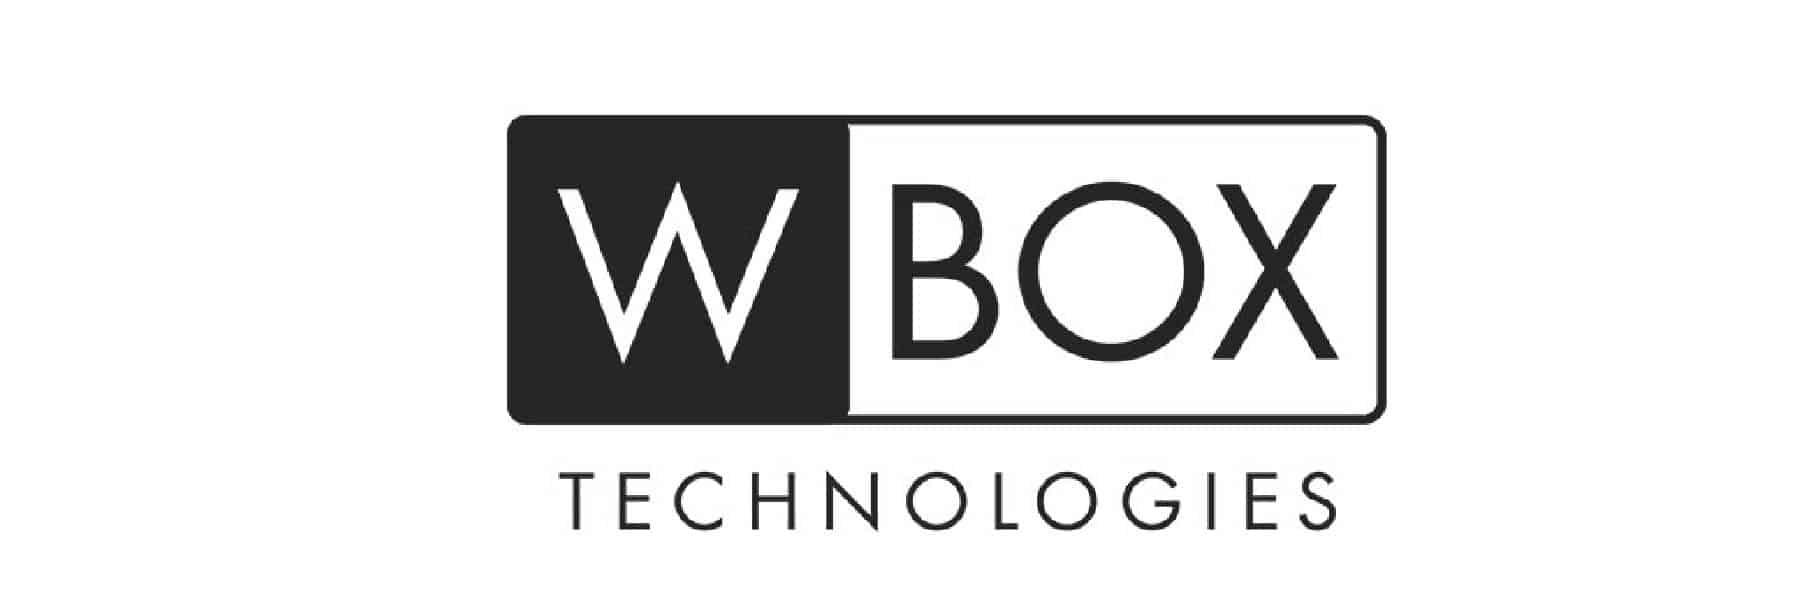 wbox technologies